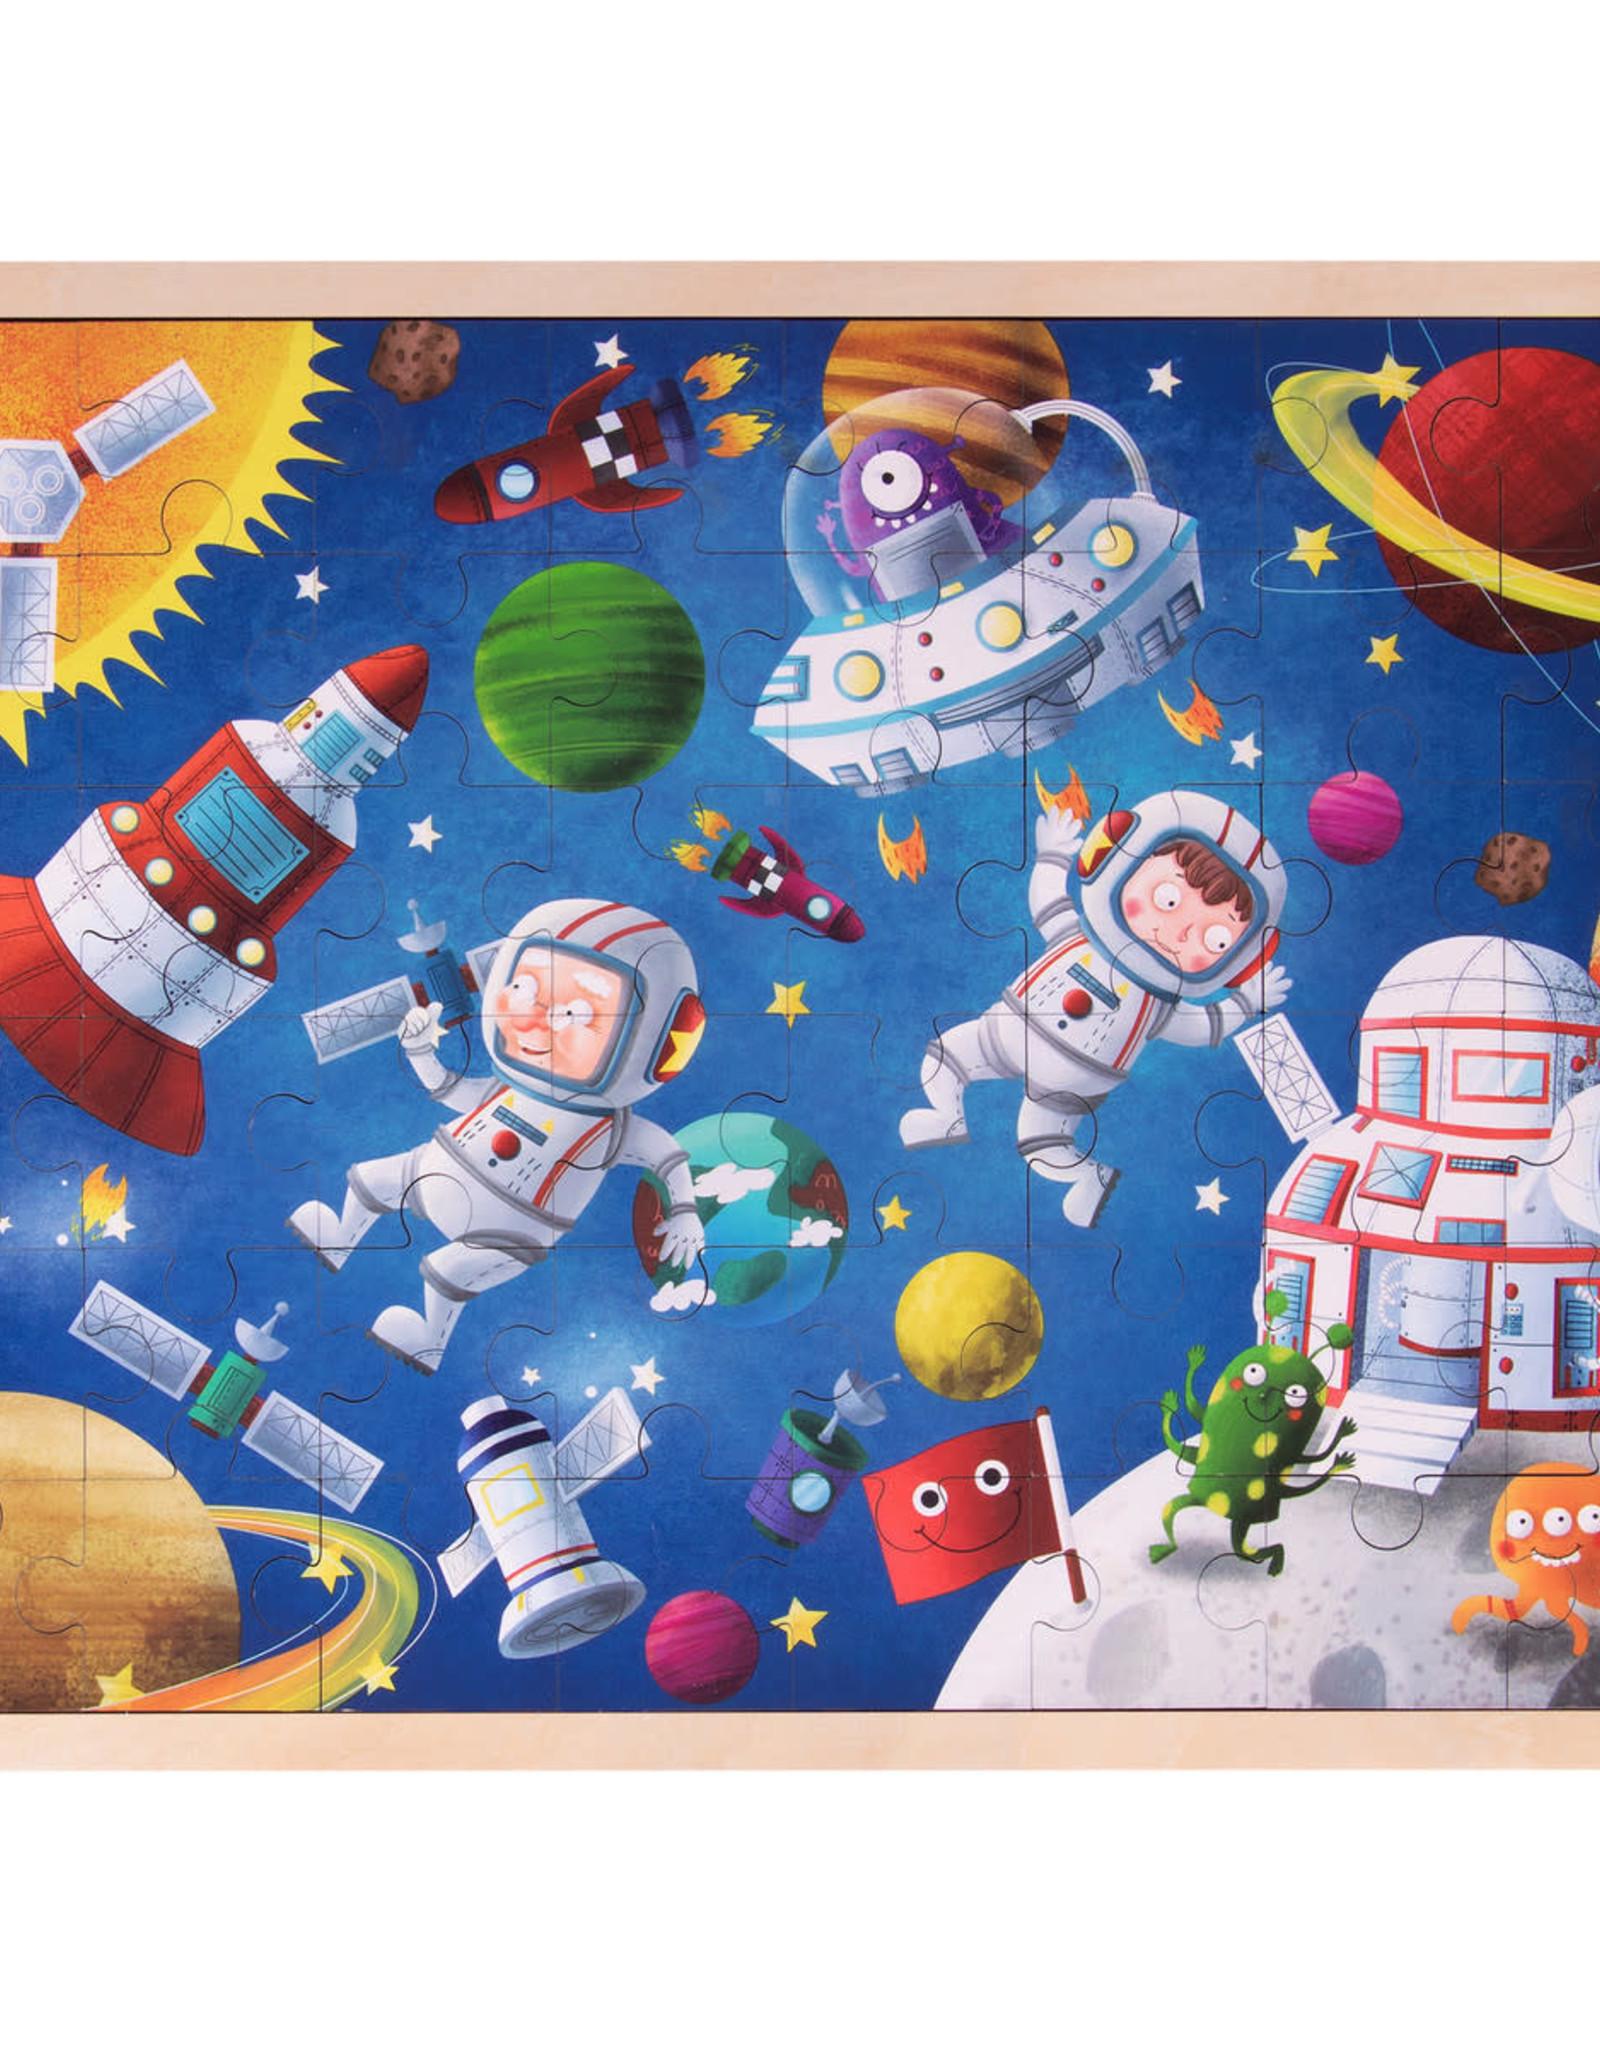 Imagination Generation Adventurous Astronauts Wooden Jigsaw 48pc Puzzle